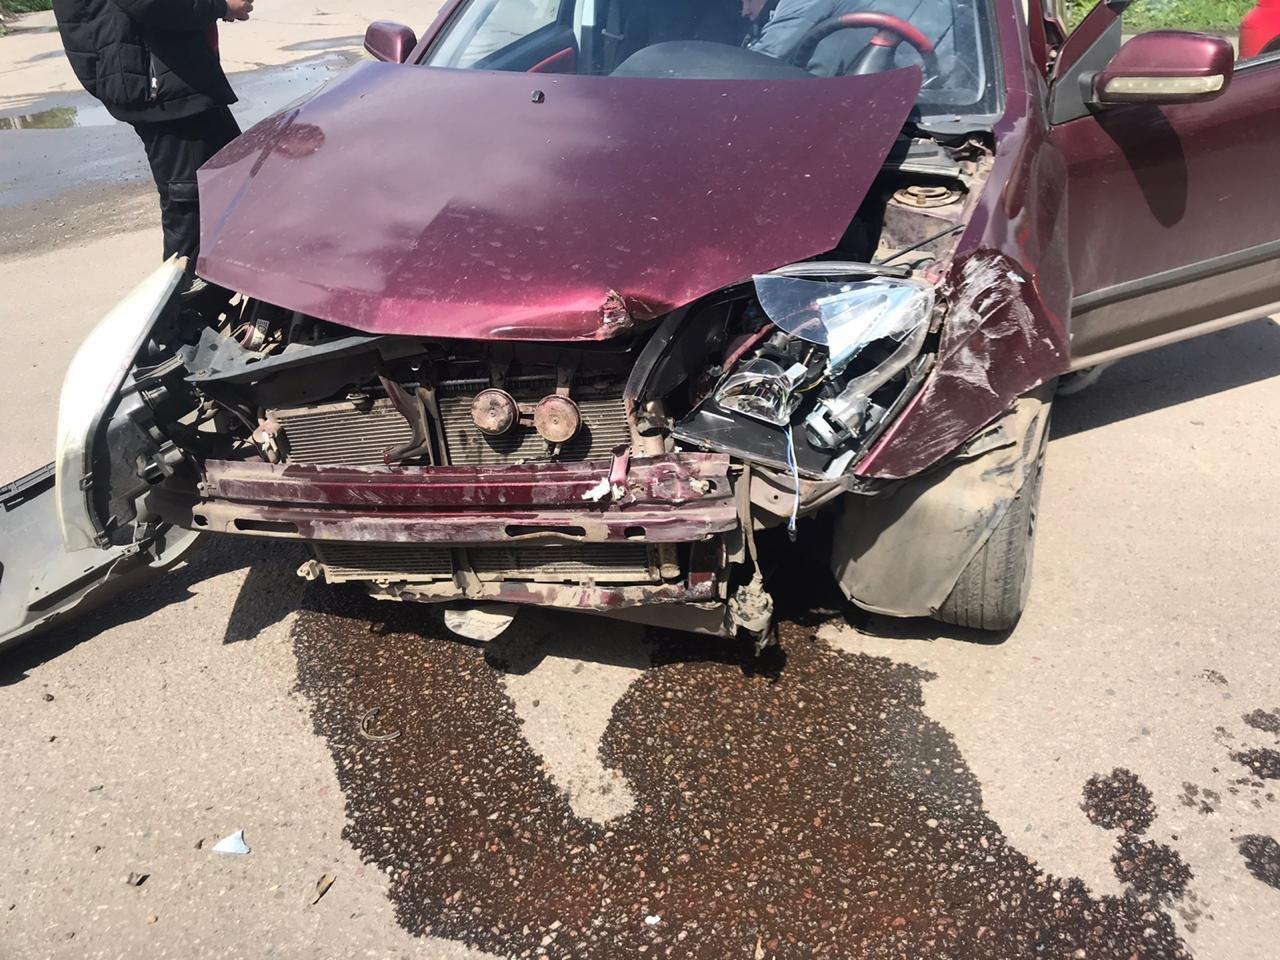 В Мичуринске две автоледи не поделили дорогу, а пострадал пешеход, фото-2